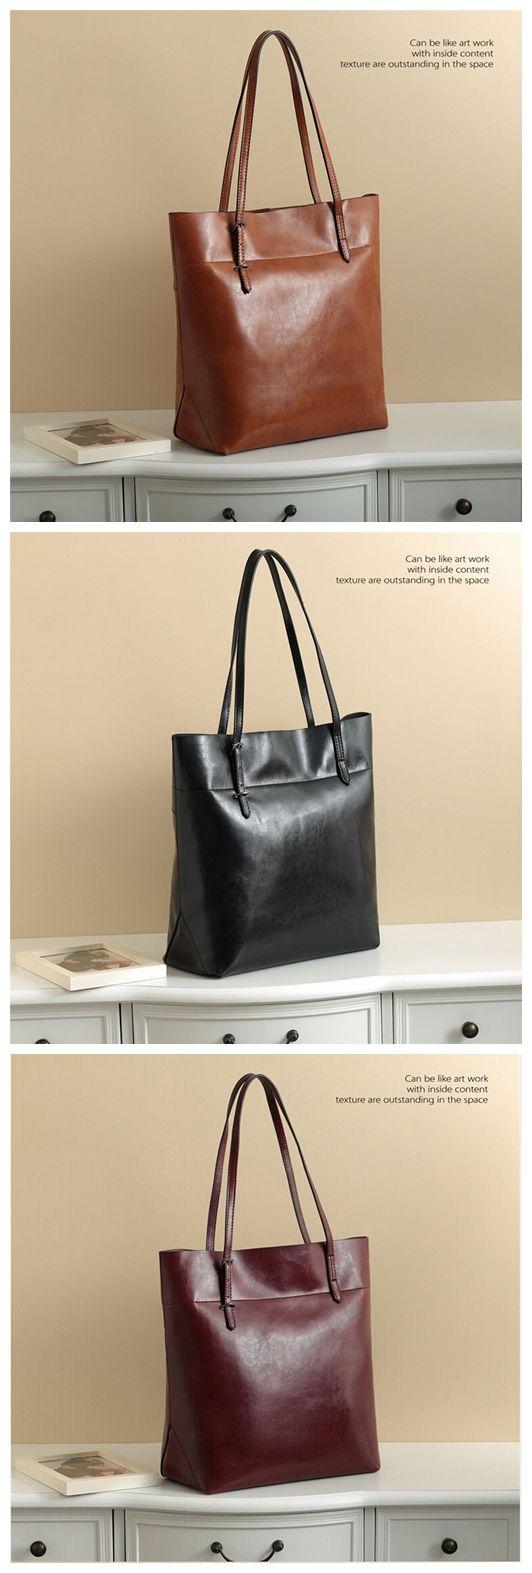 c503bfe8e028 Handmade Genuine Leather Women s Fashion Tote Handbag Shoulder Bag 14149  Overview: Design  Women Fashion Tote Include  Only Handbag Custom  No  Color  ...